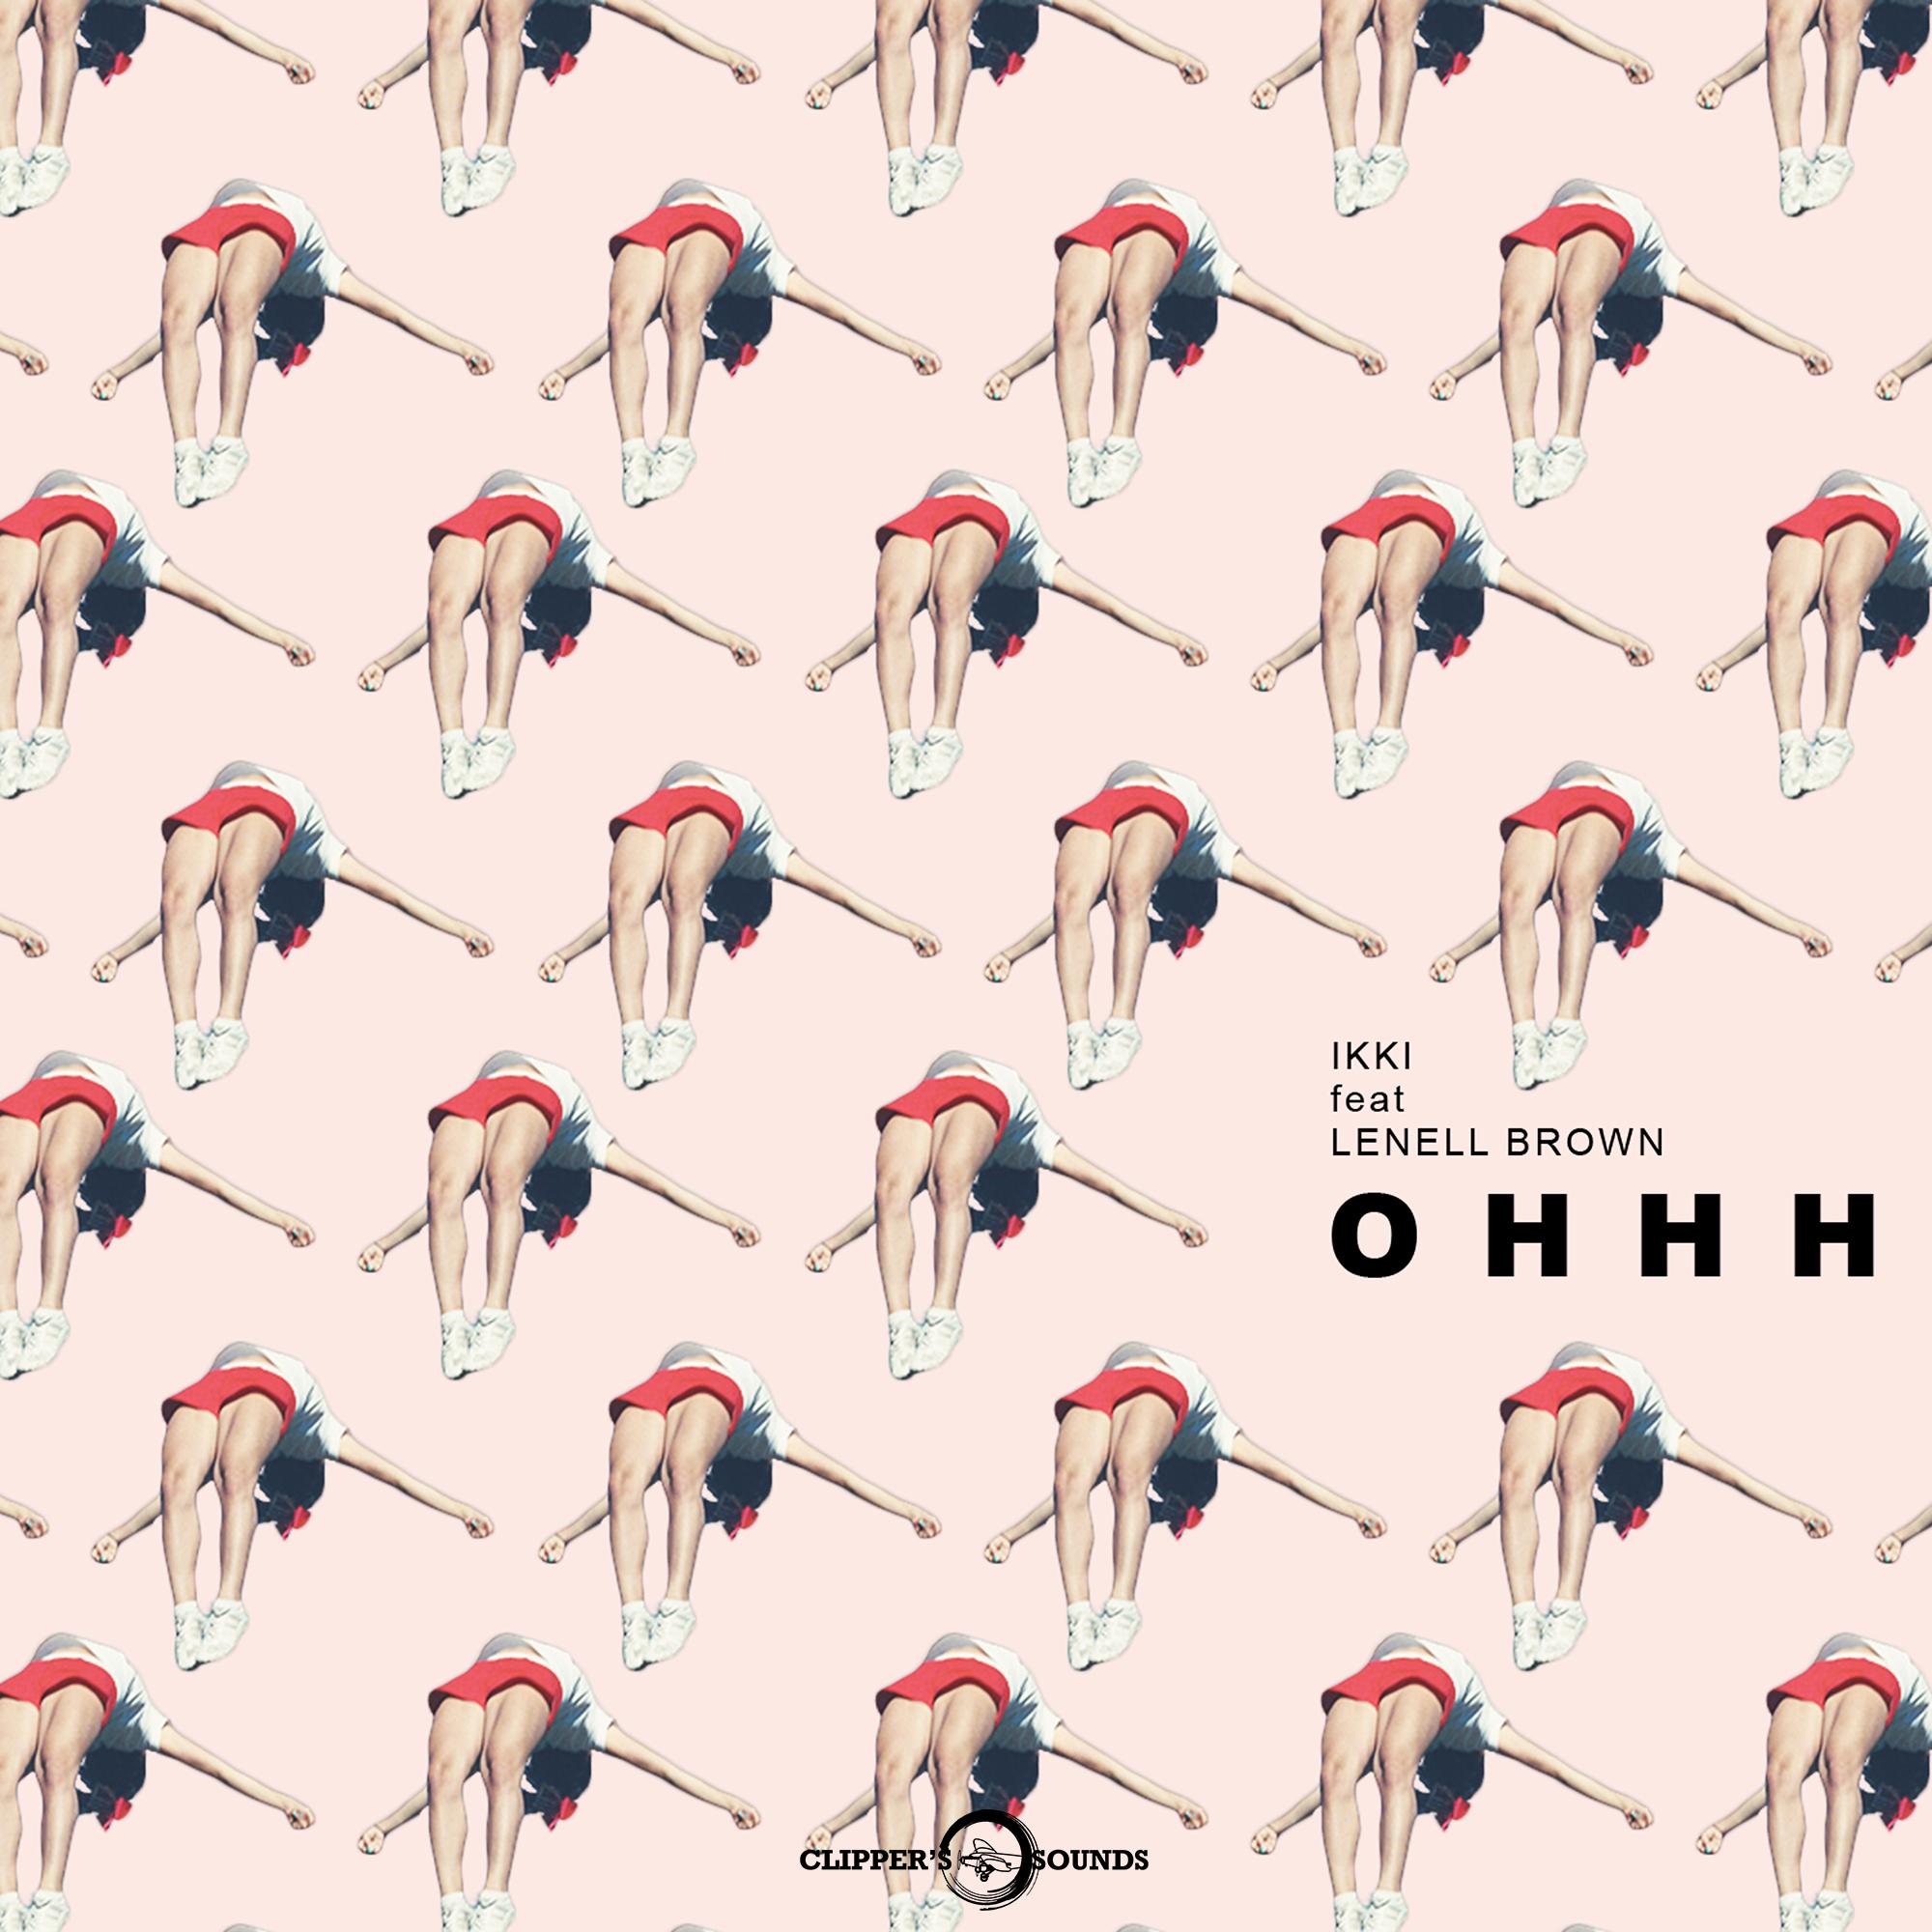 OHHH-1